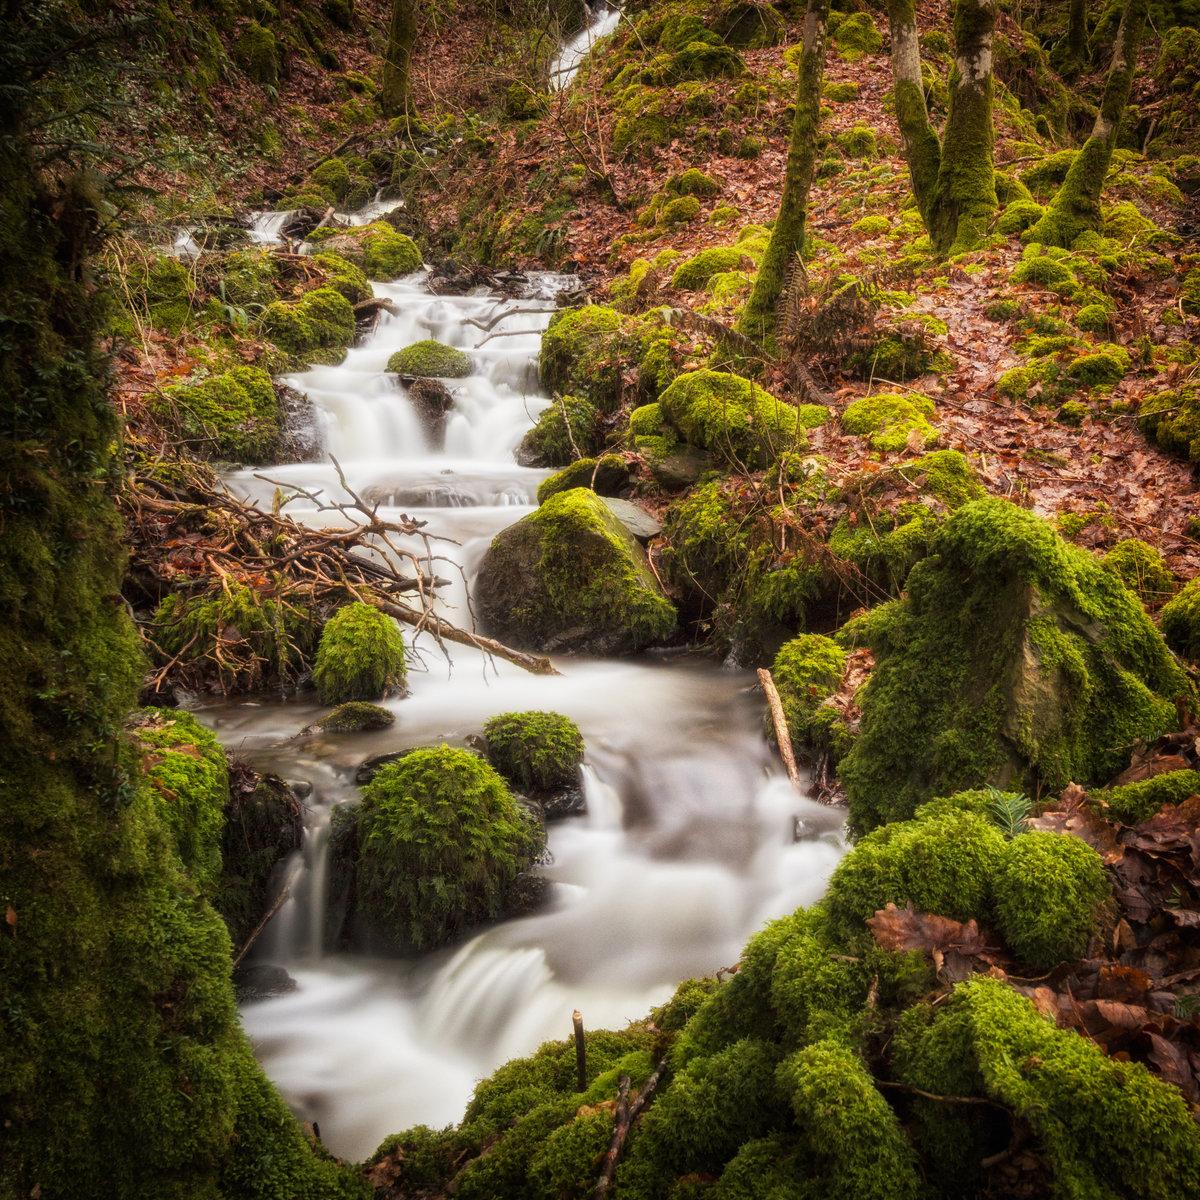 _2234168 - Rivers & Lakes of Cumbria